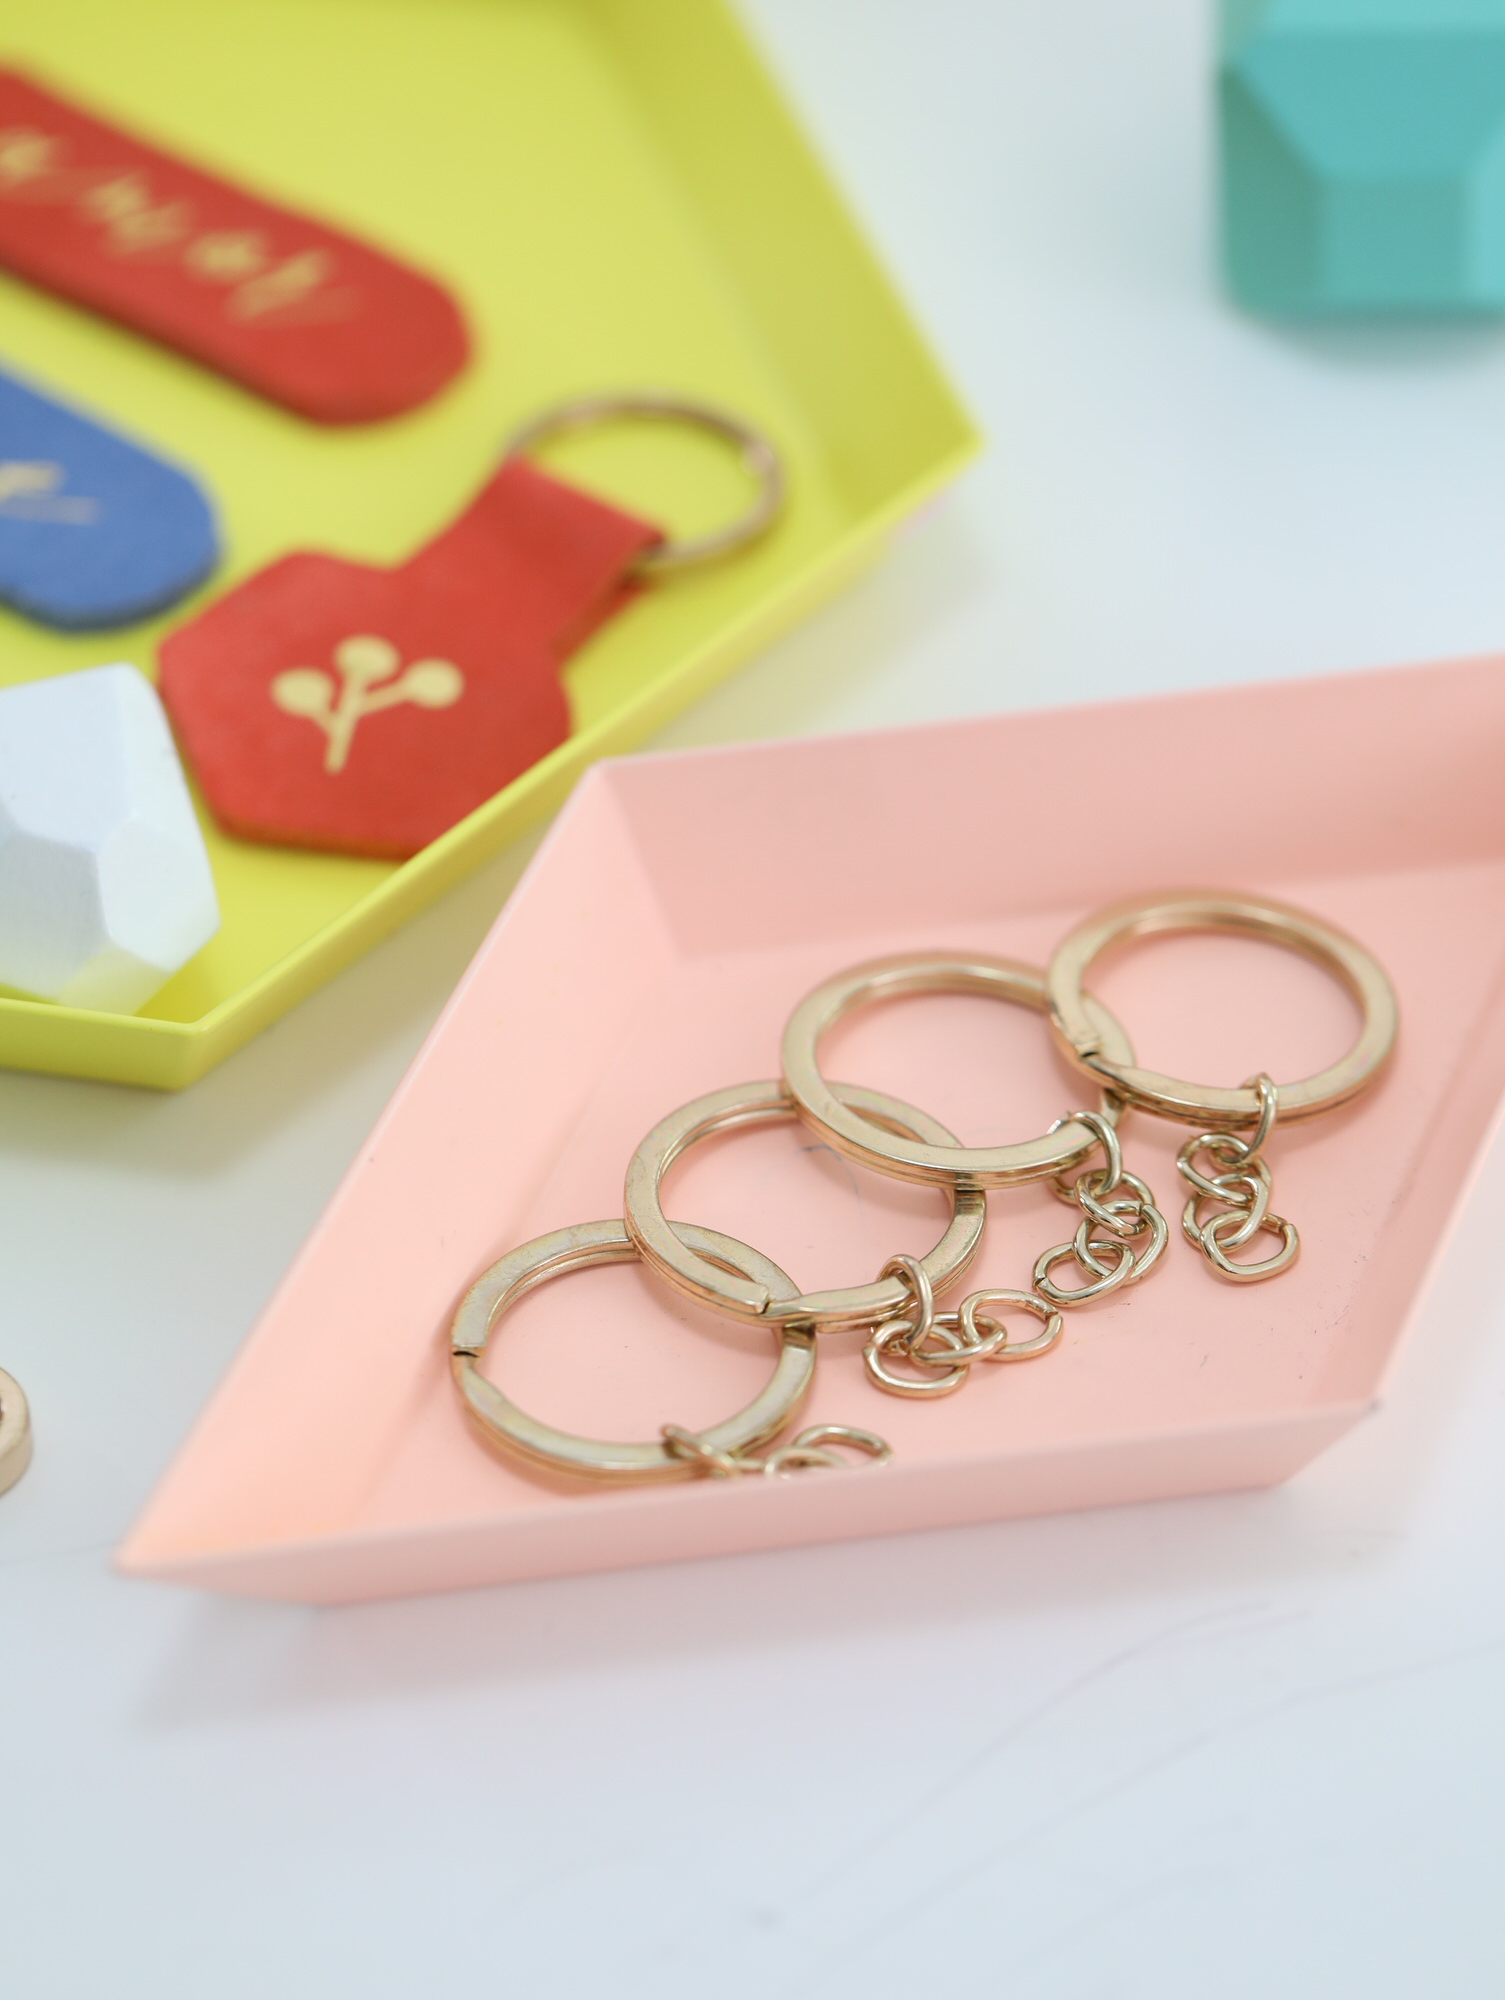 Googly Gooeys DIY Suede Leather Keychain Bookmark Cricut Template